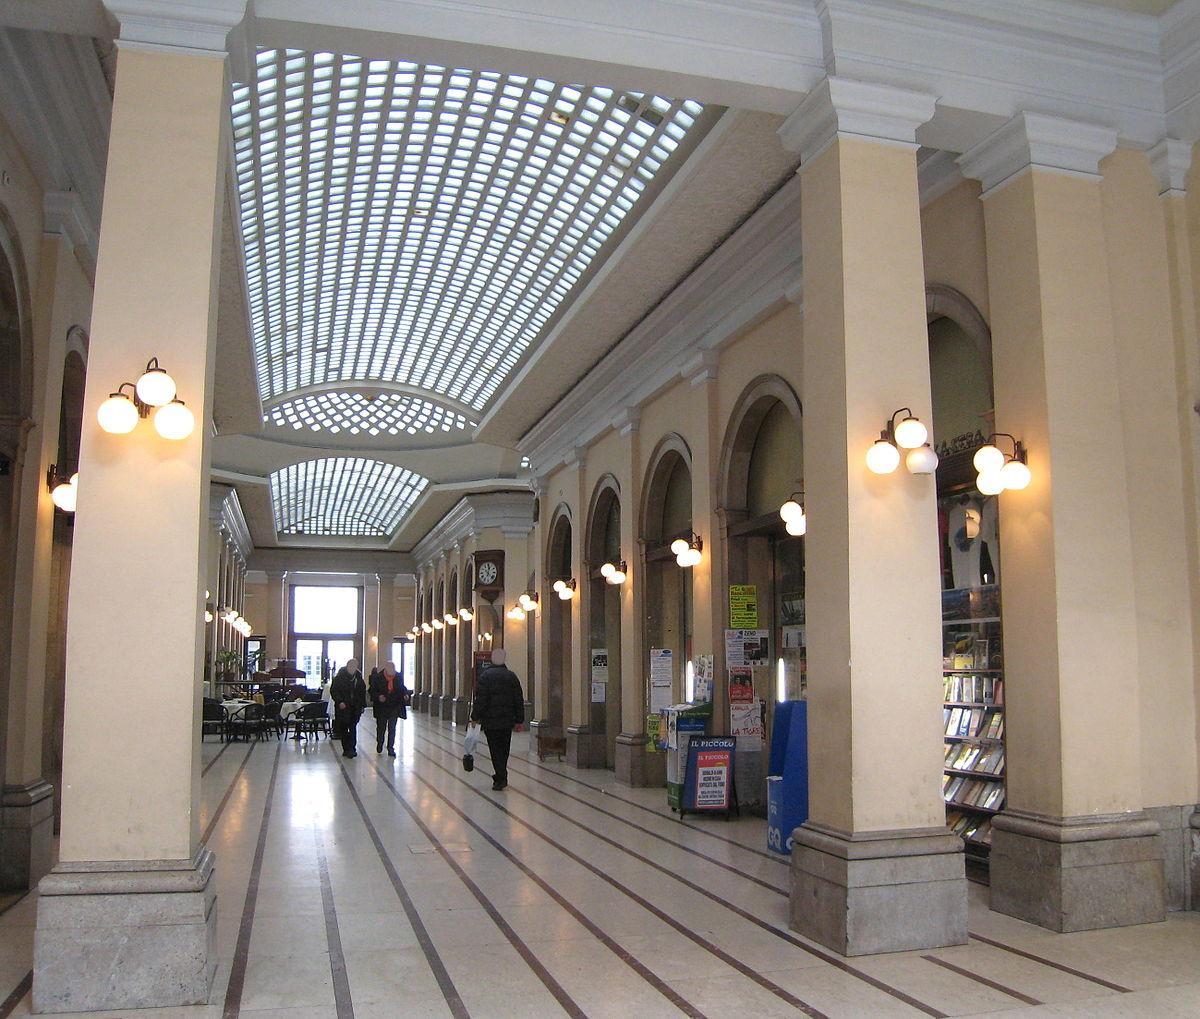 File:Tergesteo Trieste 01.jpg - Wikipedia